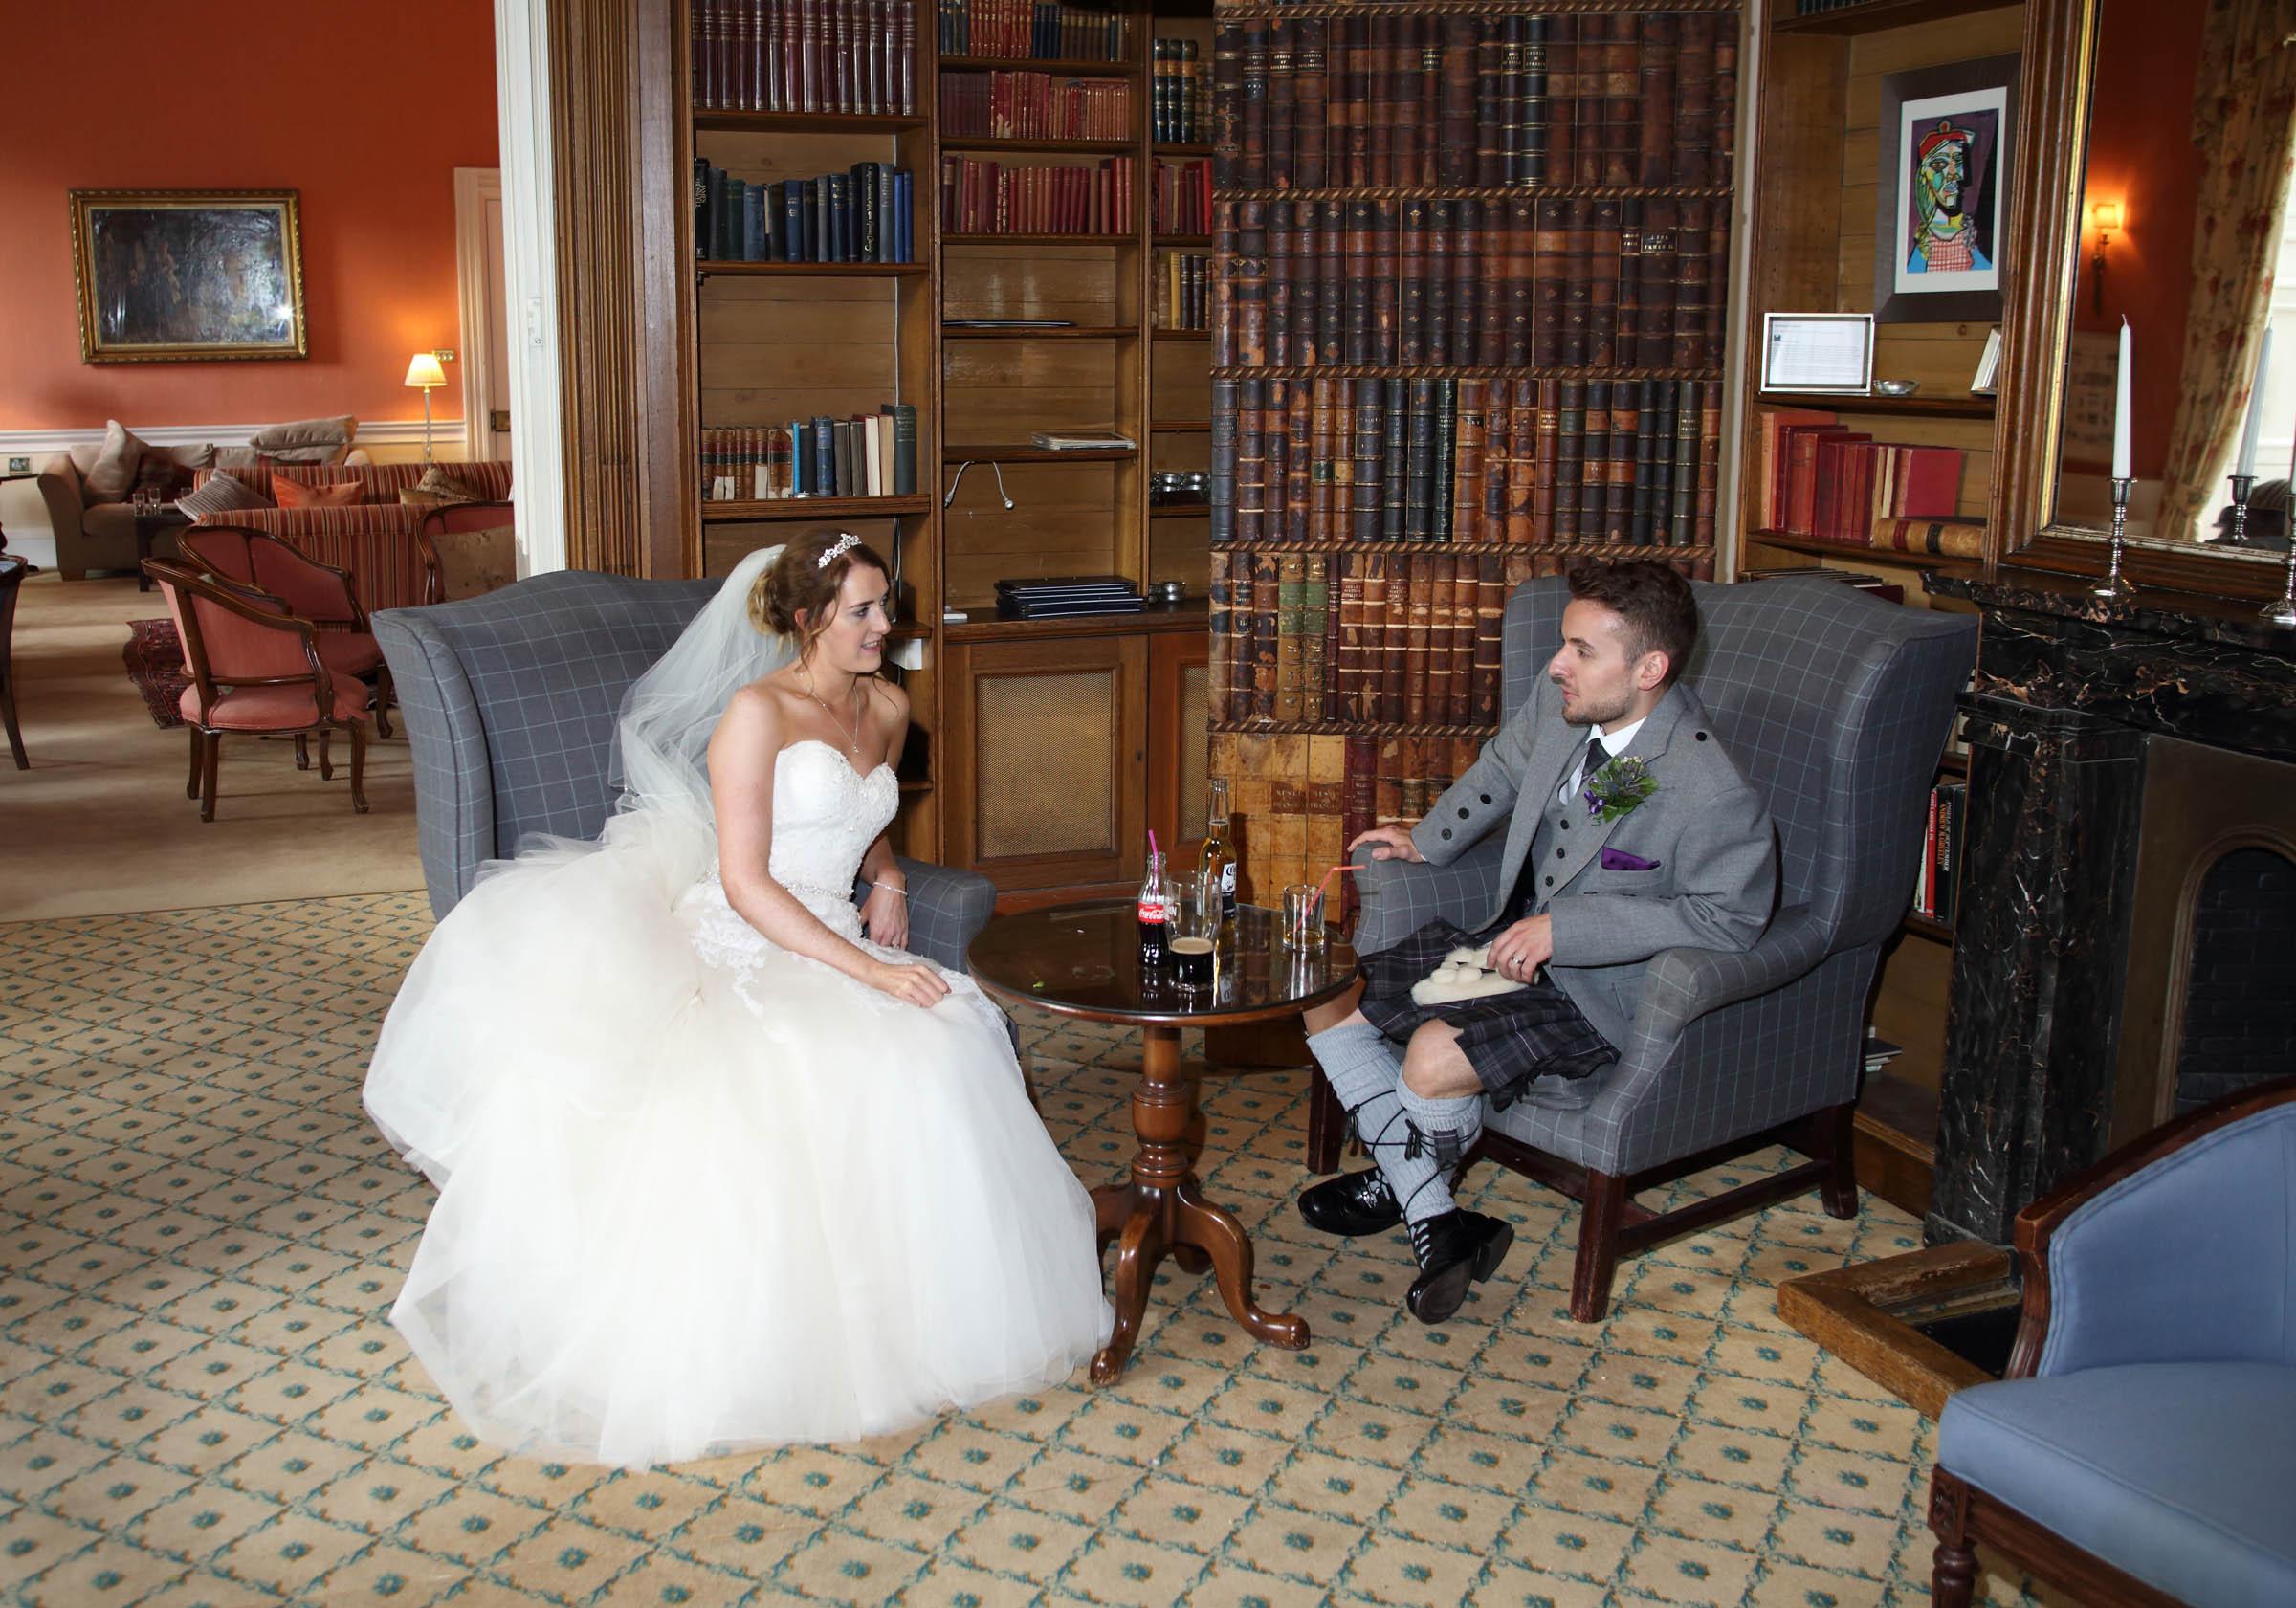 Wedding_reportage_photograph.jpg